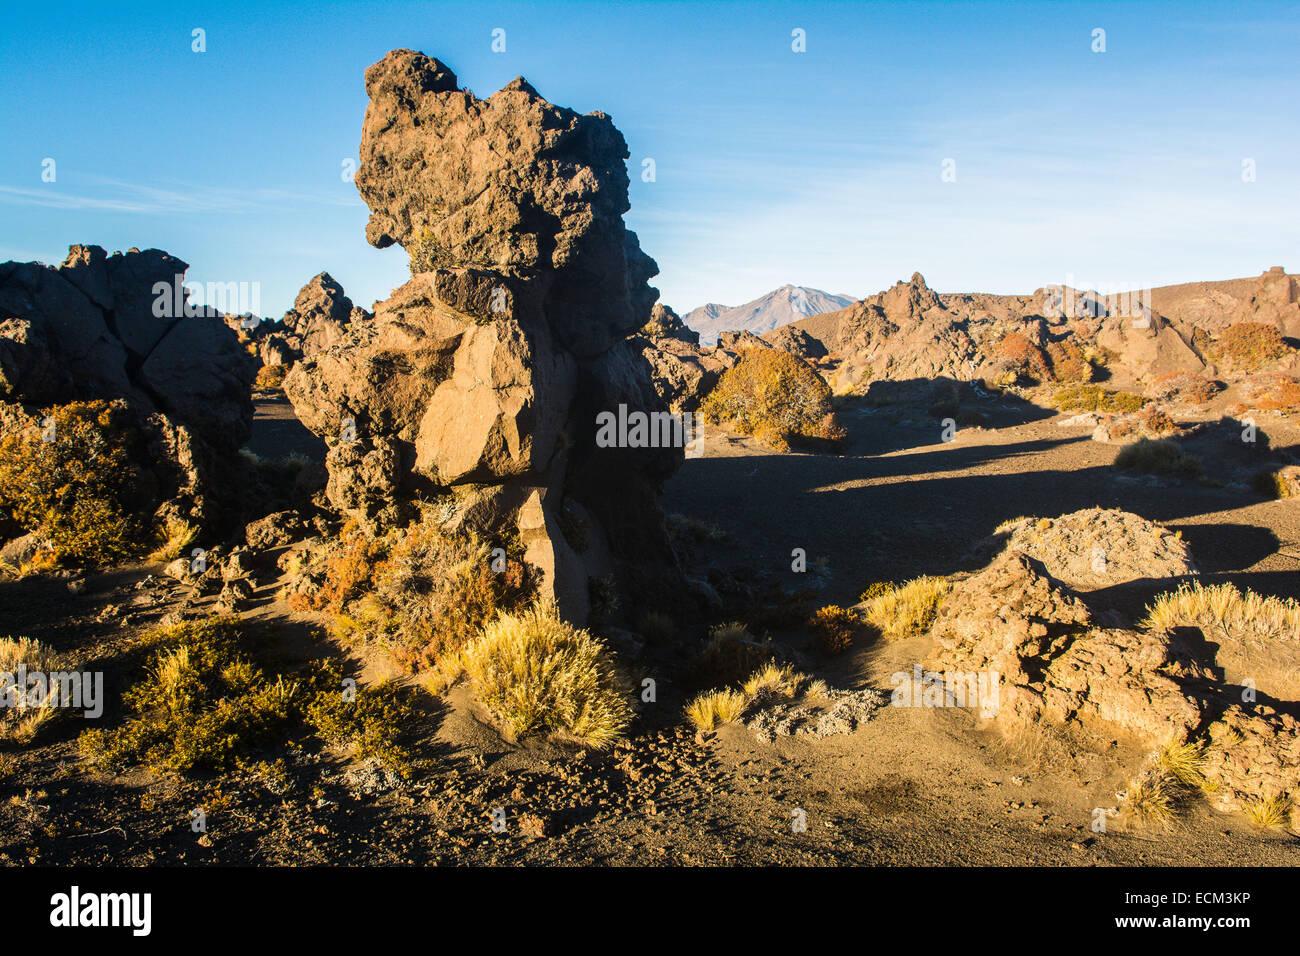 Mt. Ruapehu, Northern Circuit hike, Tongariro National Park, North Island, New Zealand - Stock Image